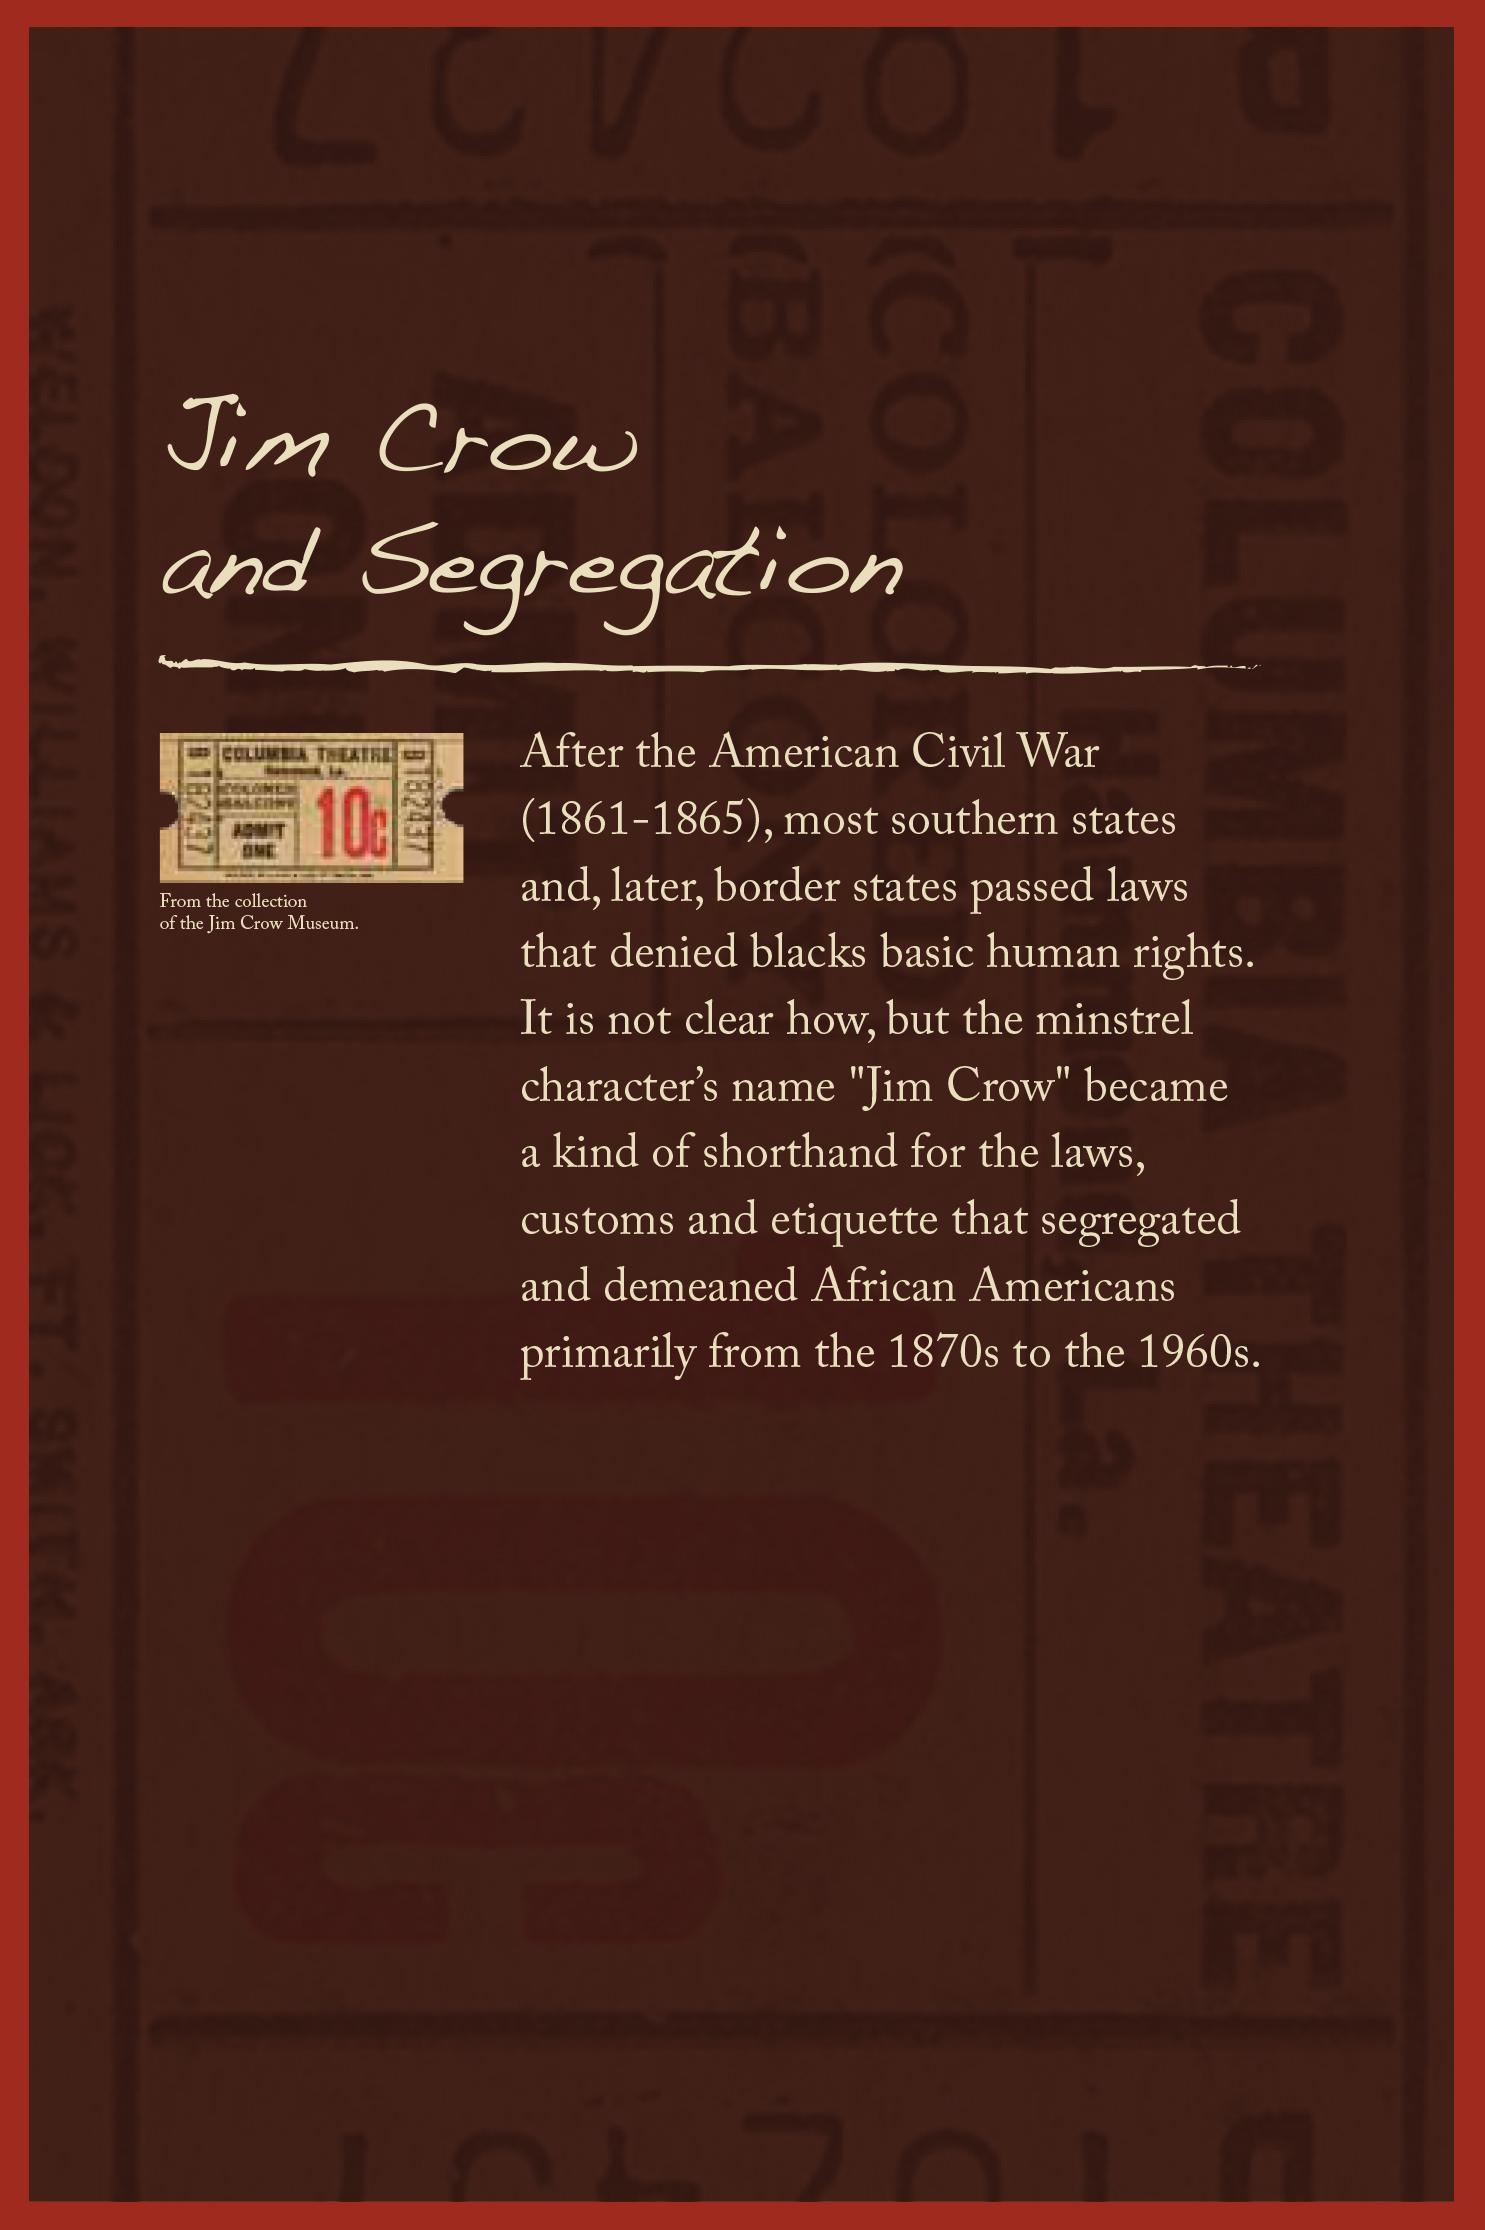 JIm Crow and Segregation.jpg